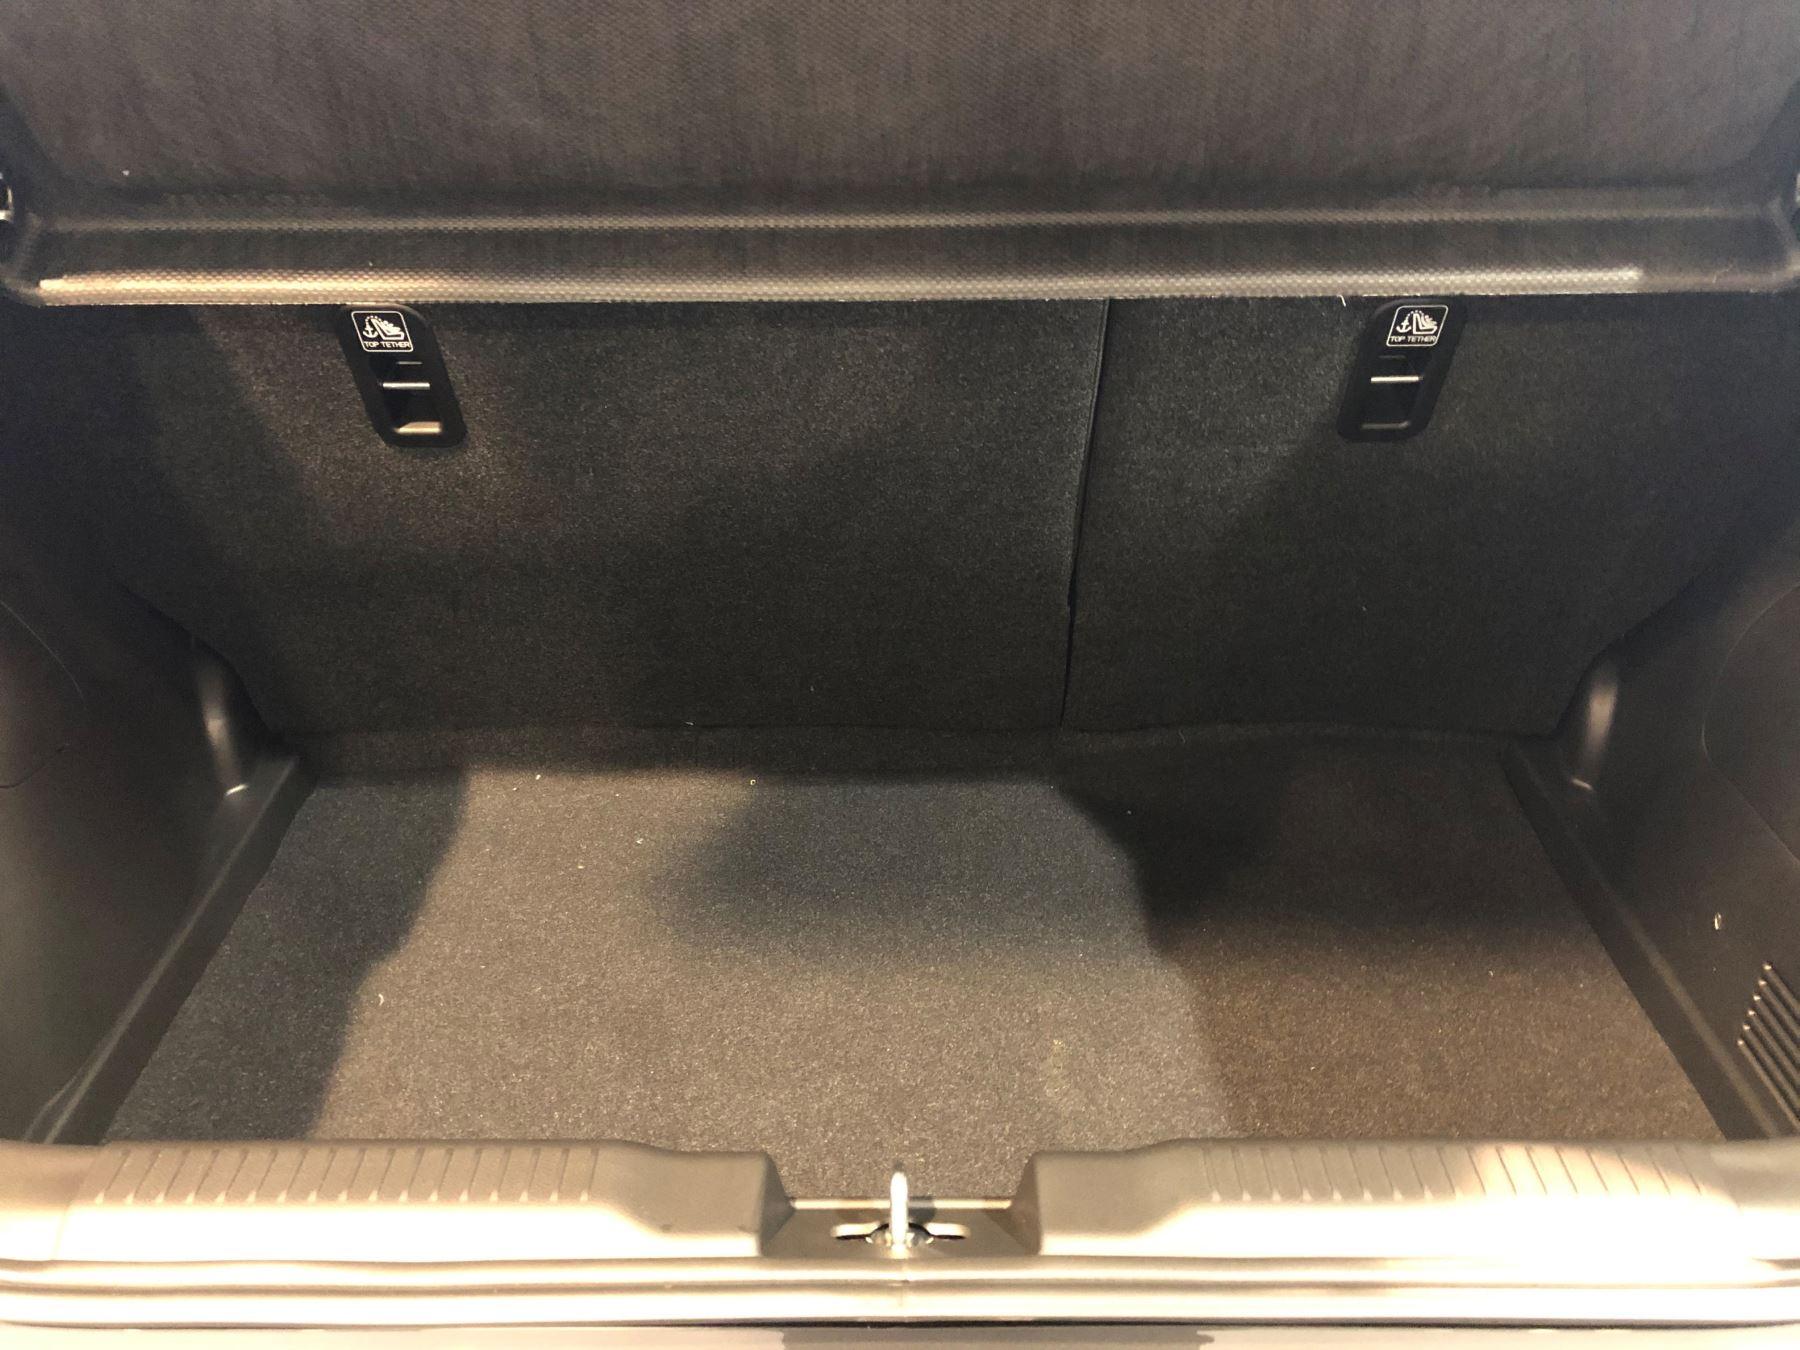 Suzuki Swift 1.2 Dualjet SHVS SZ-T image 4